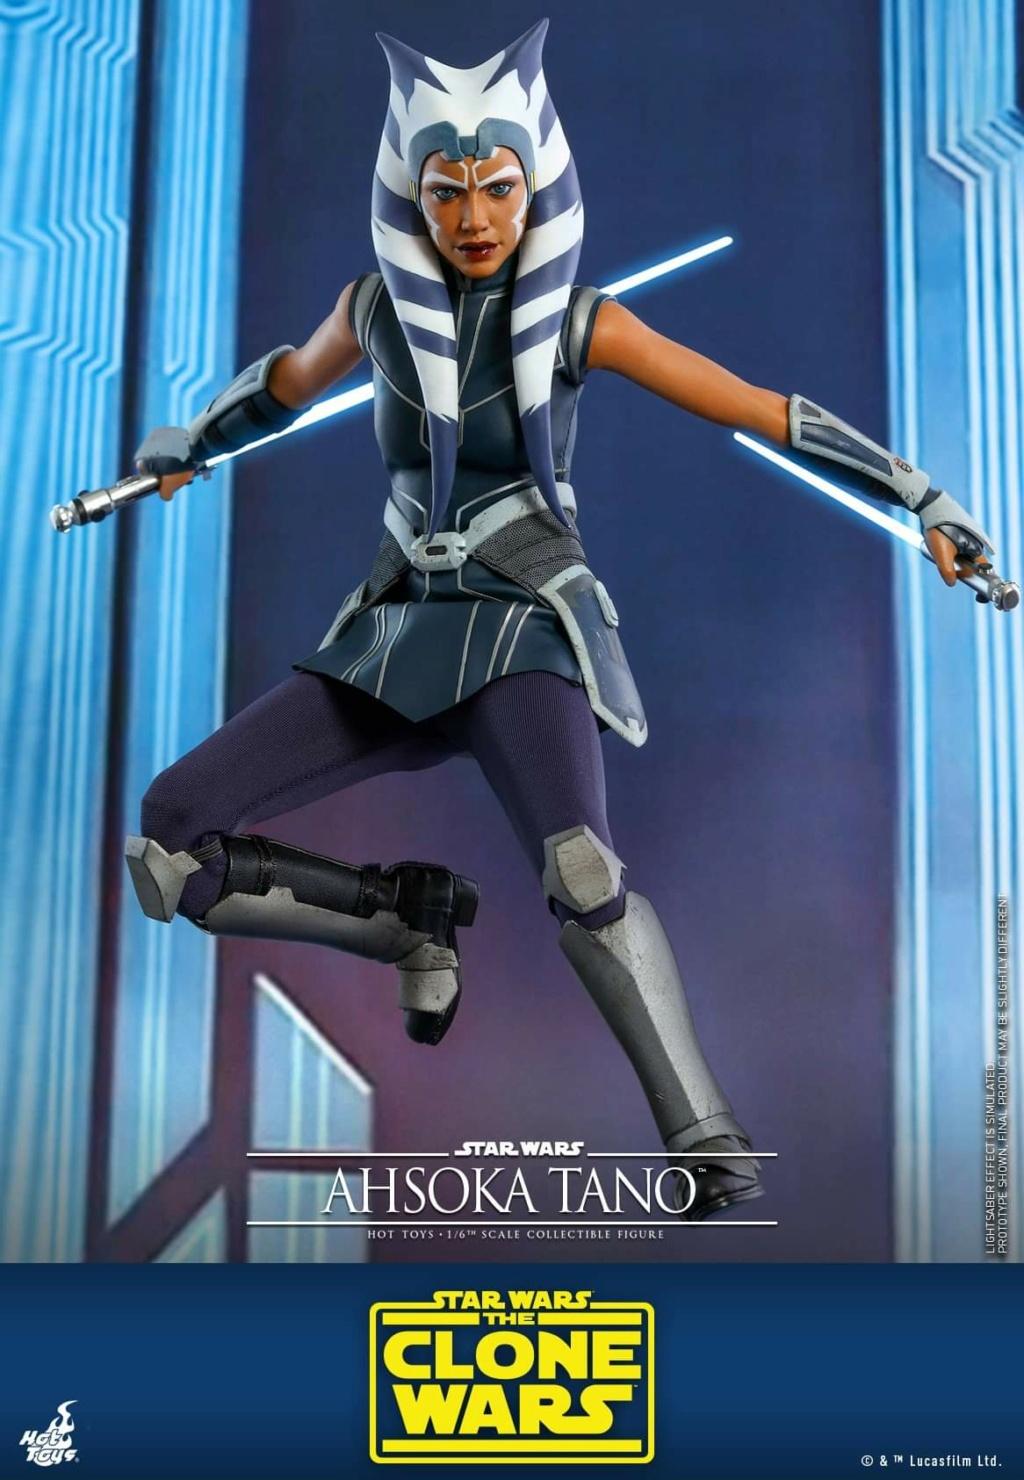 Ahsoka Tano - 1/6th scale - The Clone Wars - Hot Toys Fb_im143